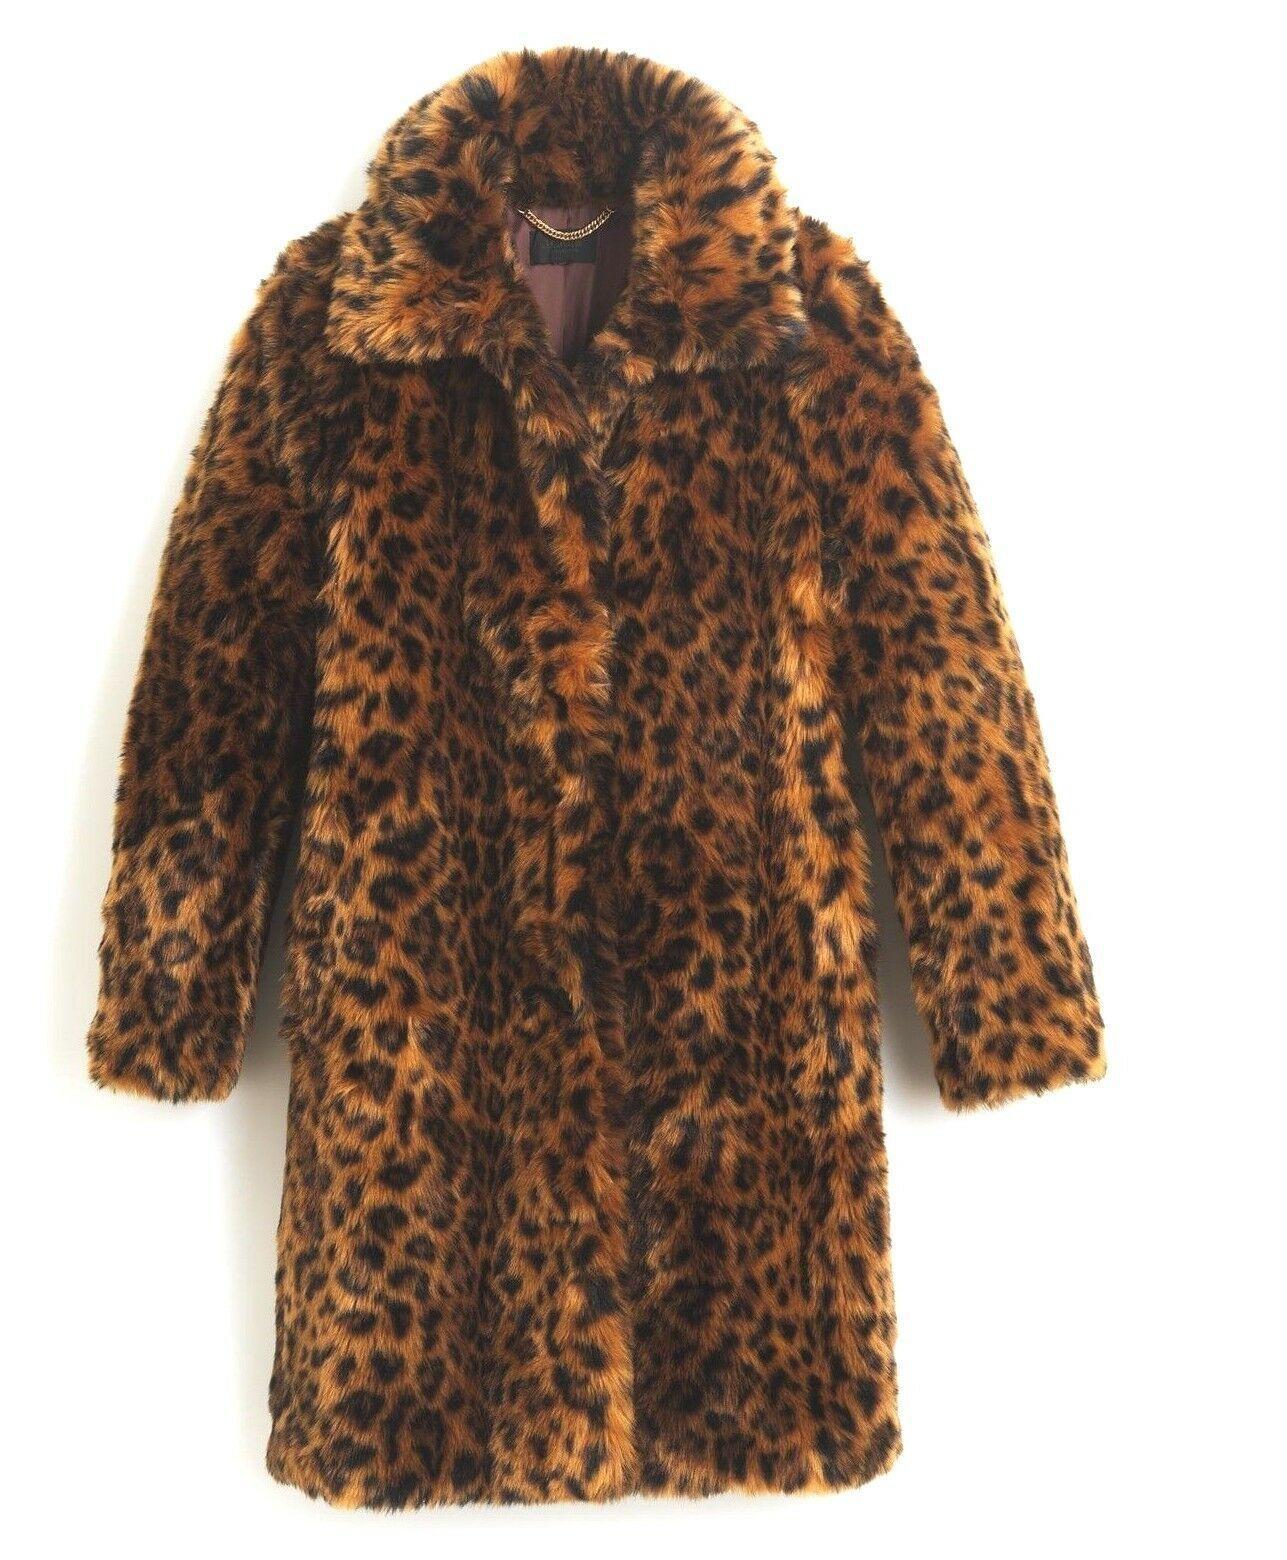 J.Crew Collection Faux-Fur Leopard Print Coat XS,S,M, L, XL,XXL,2X G9553  298